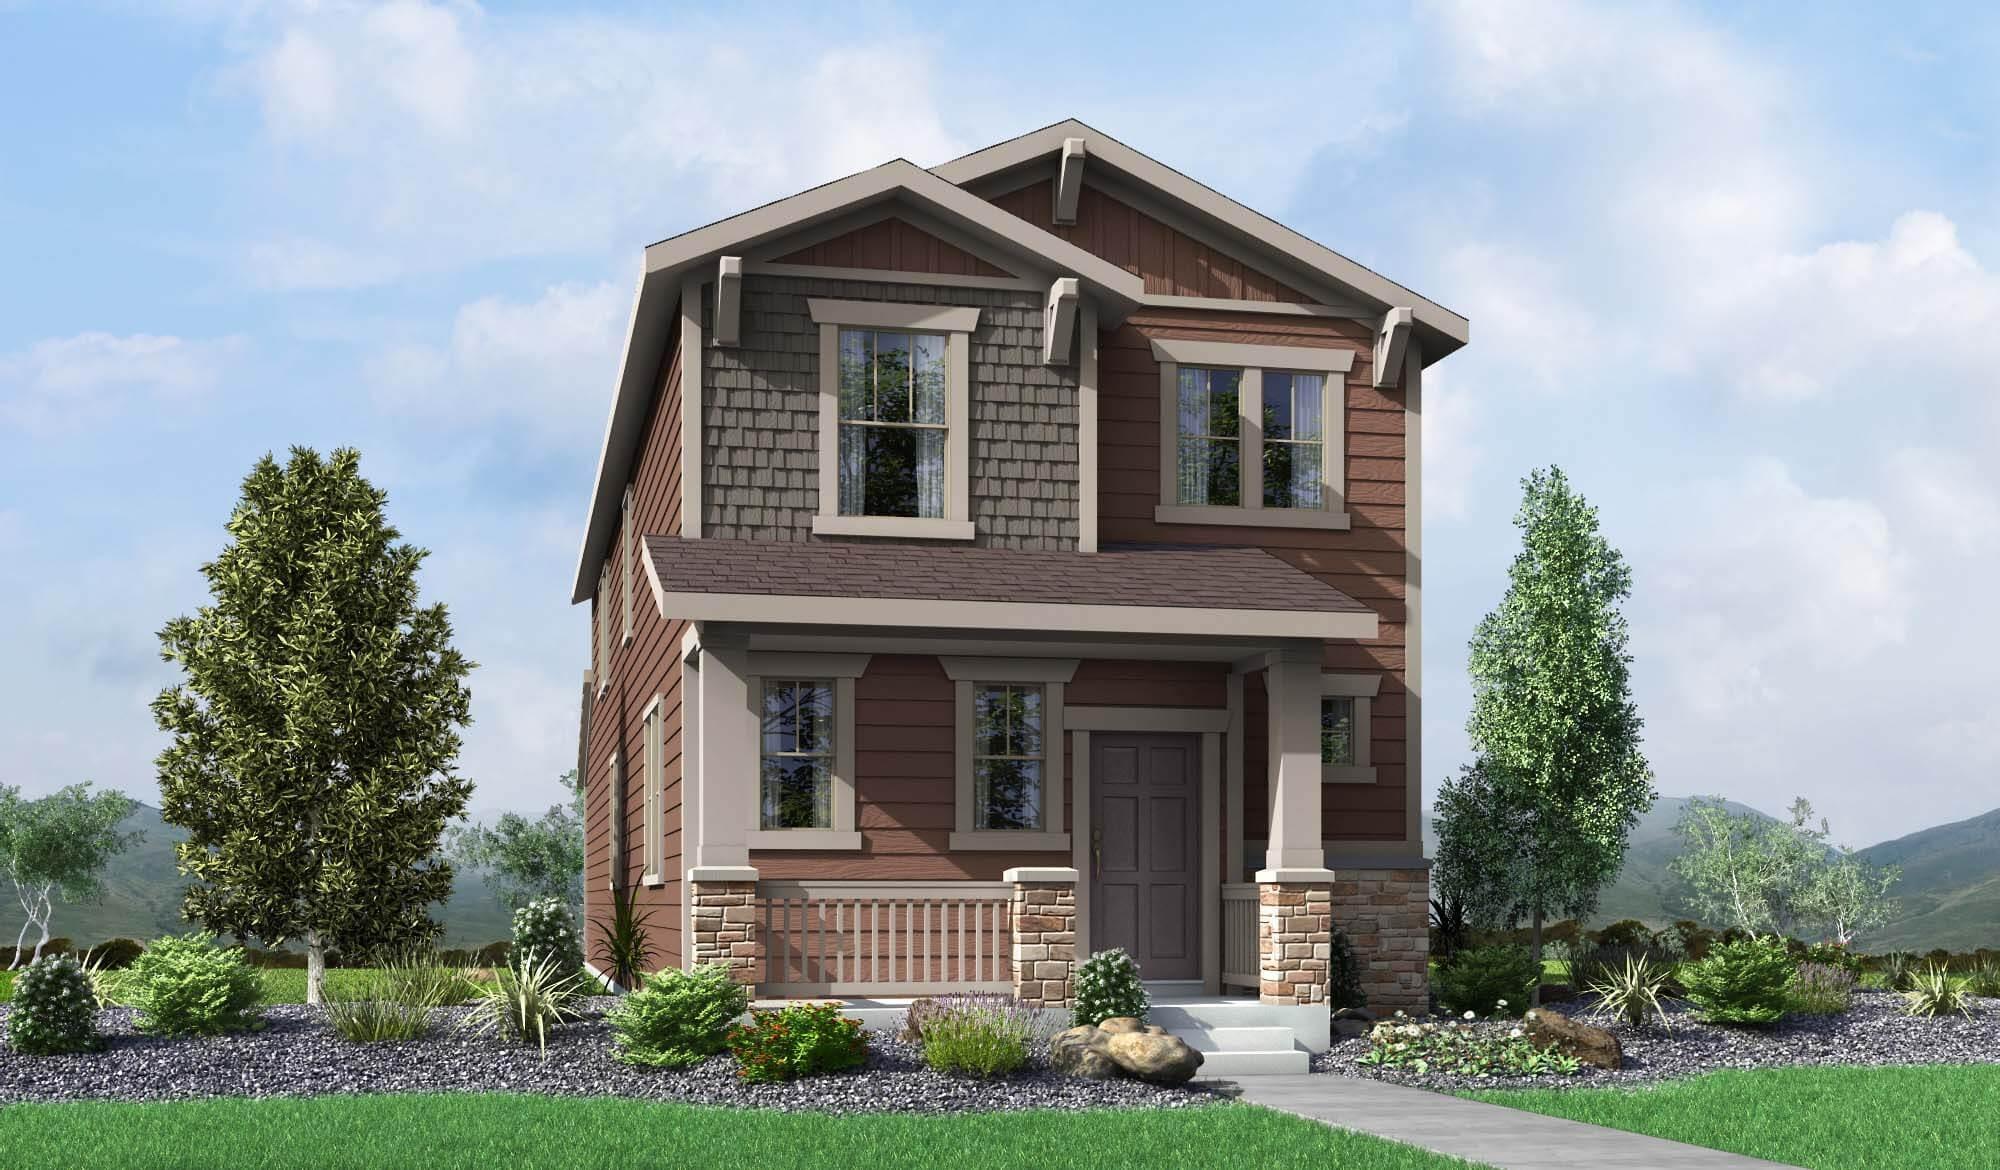 A52262_Village_Homes_Denver_Connection_22s_22C3_B_HERO20170509132624